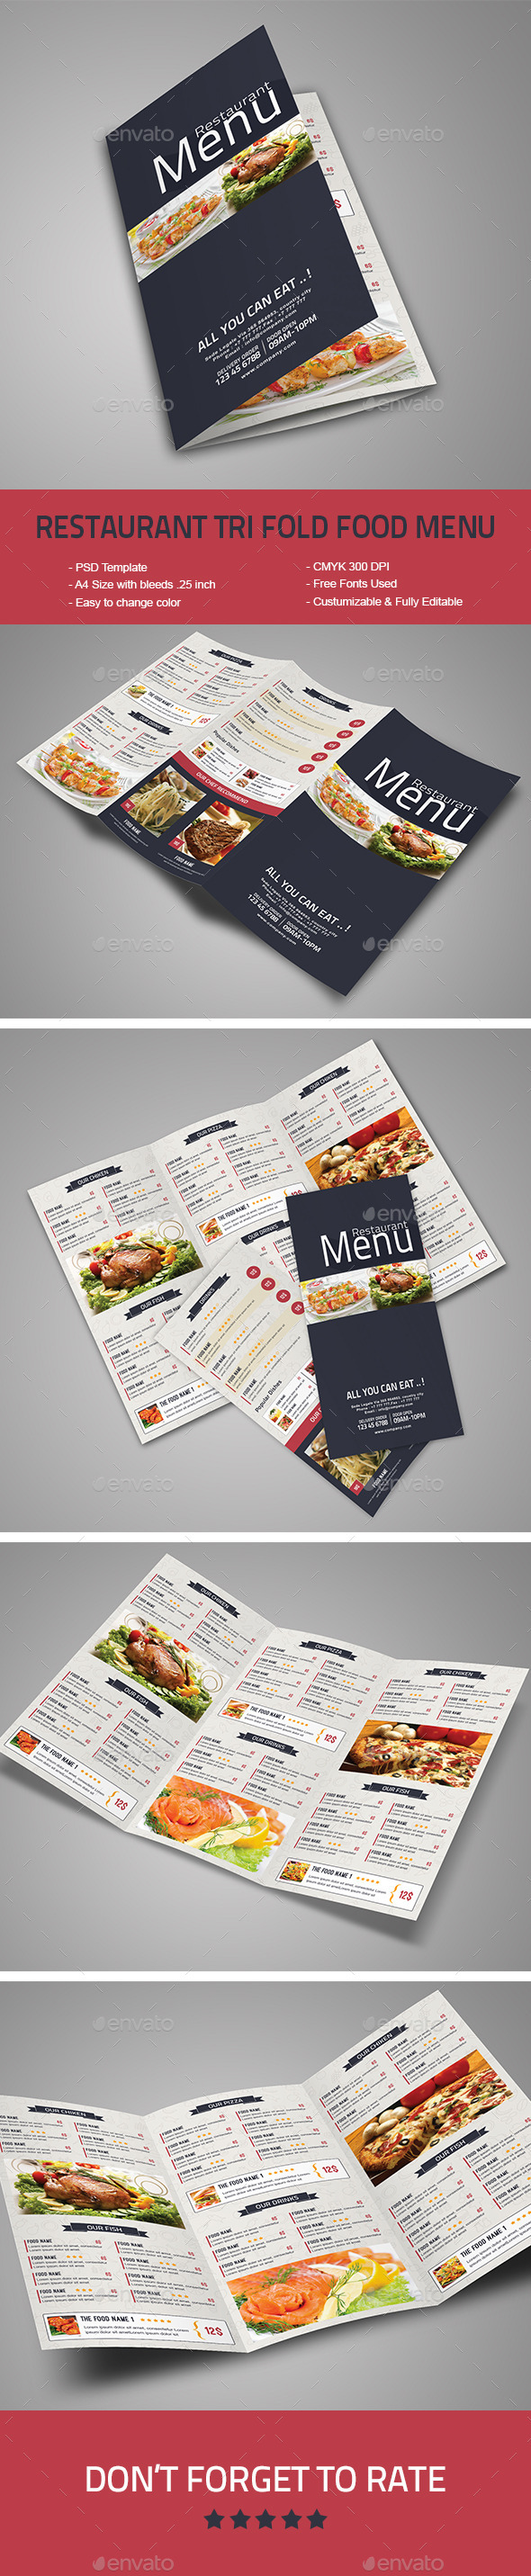 Restaurant Tri-Fold Food Menu